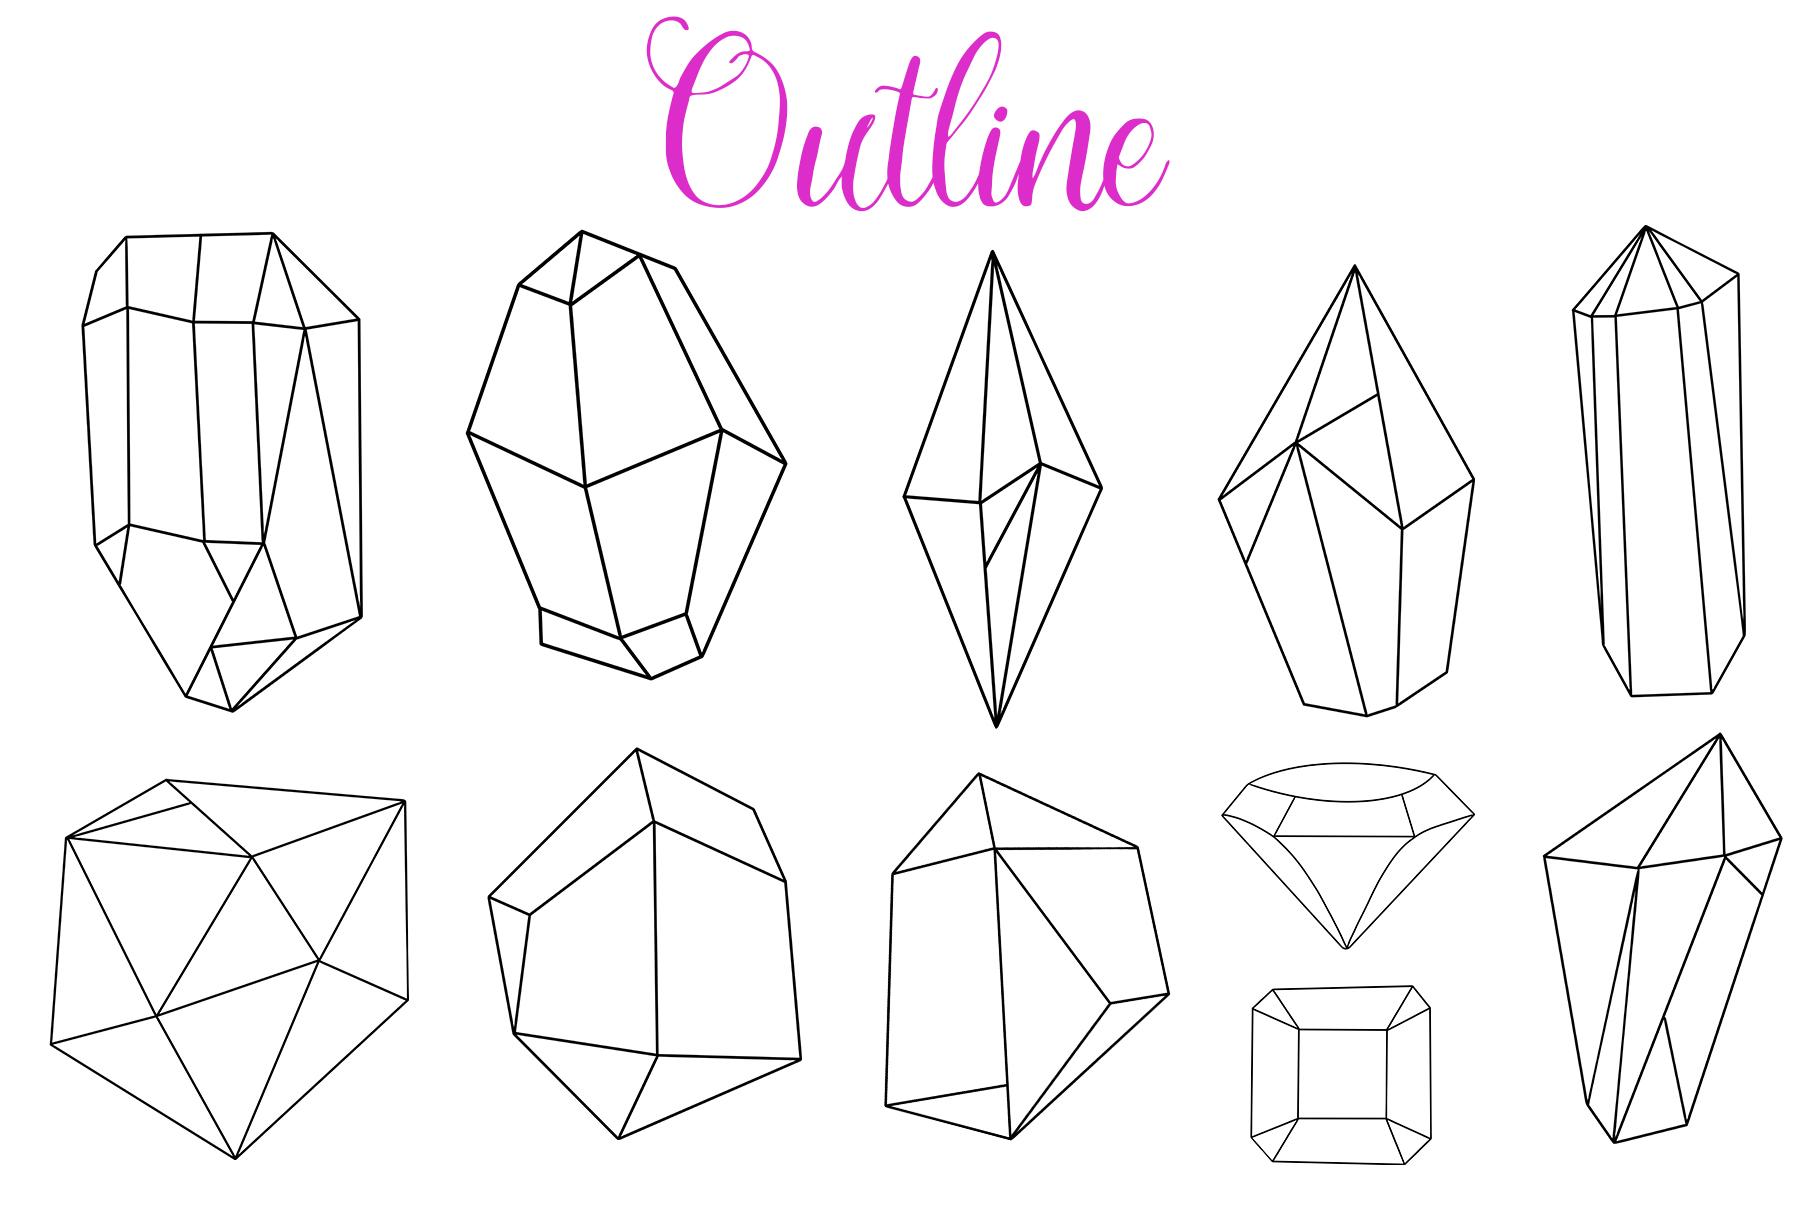 Watercolor Crystals example image 3